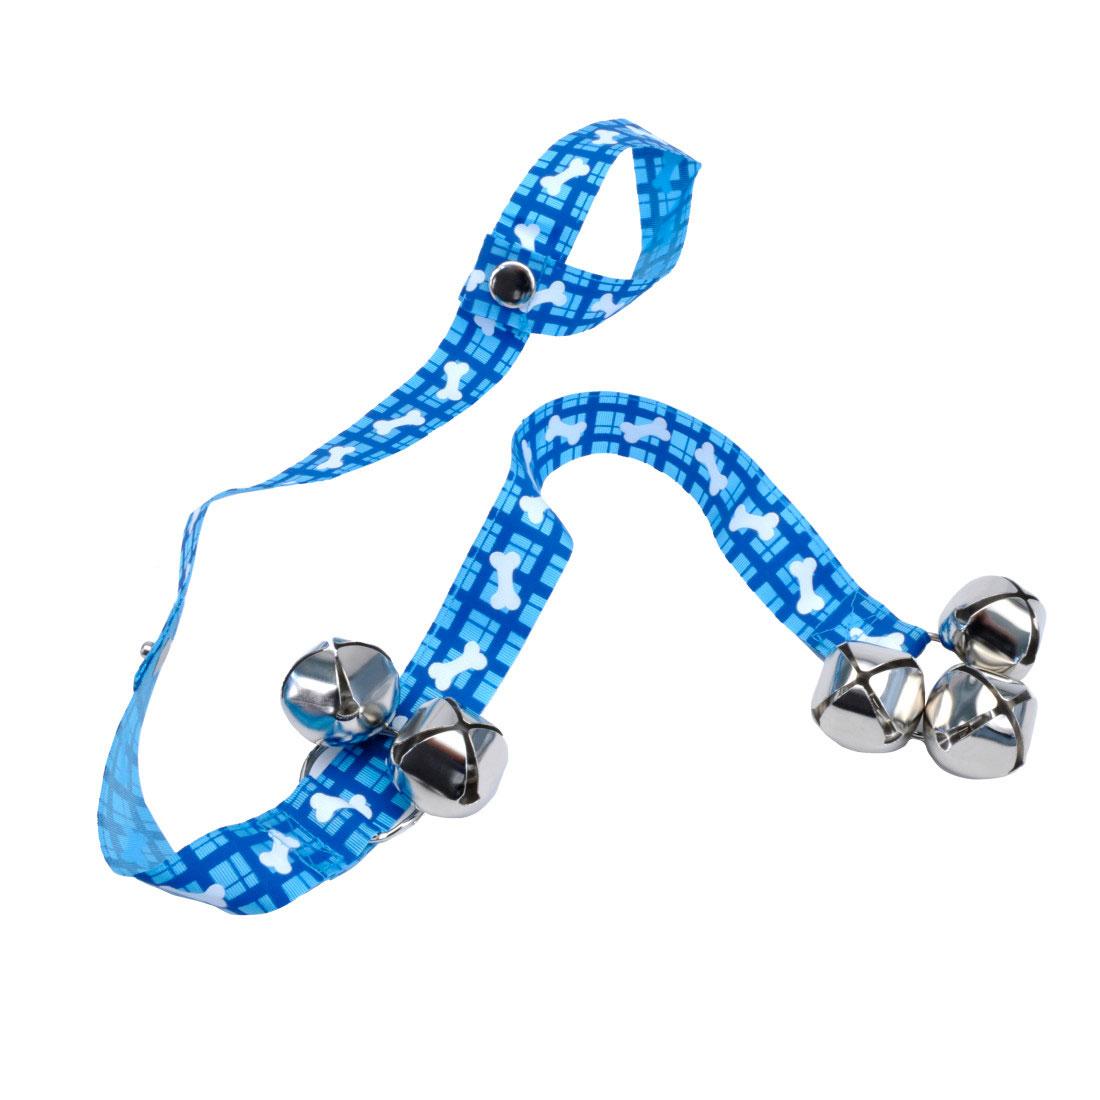 Advance Pet Patterned Dog Potty Training Bells, Plaid Bones, 31-in